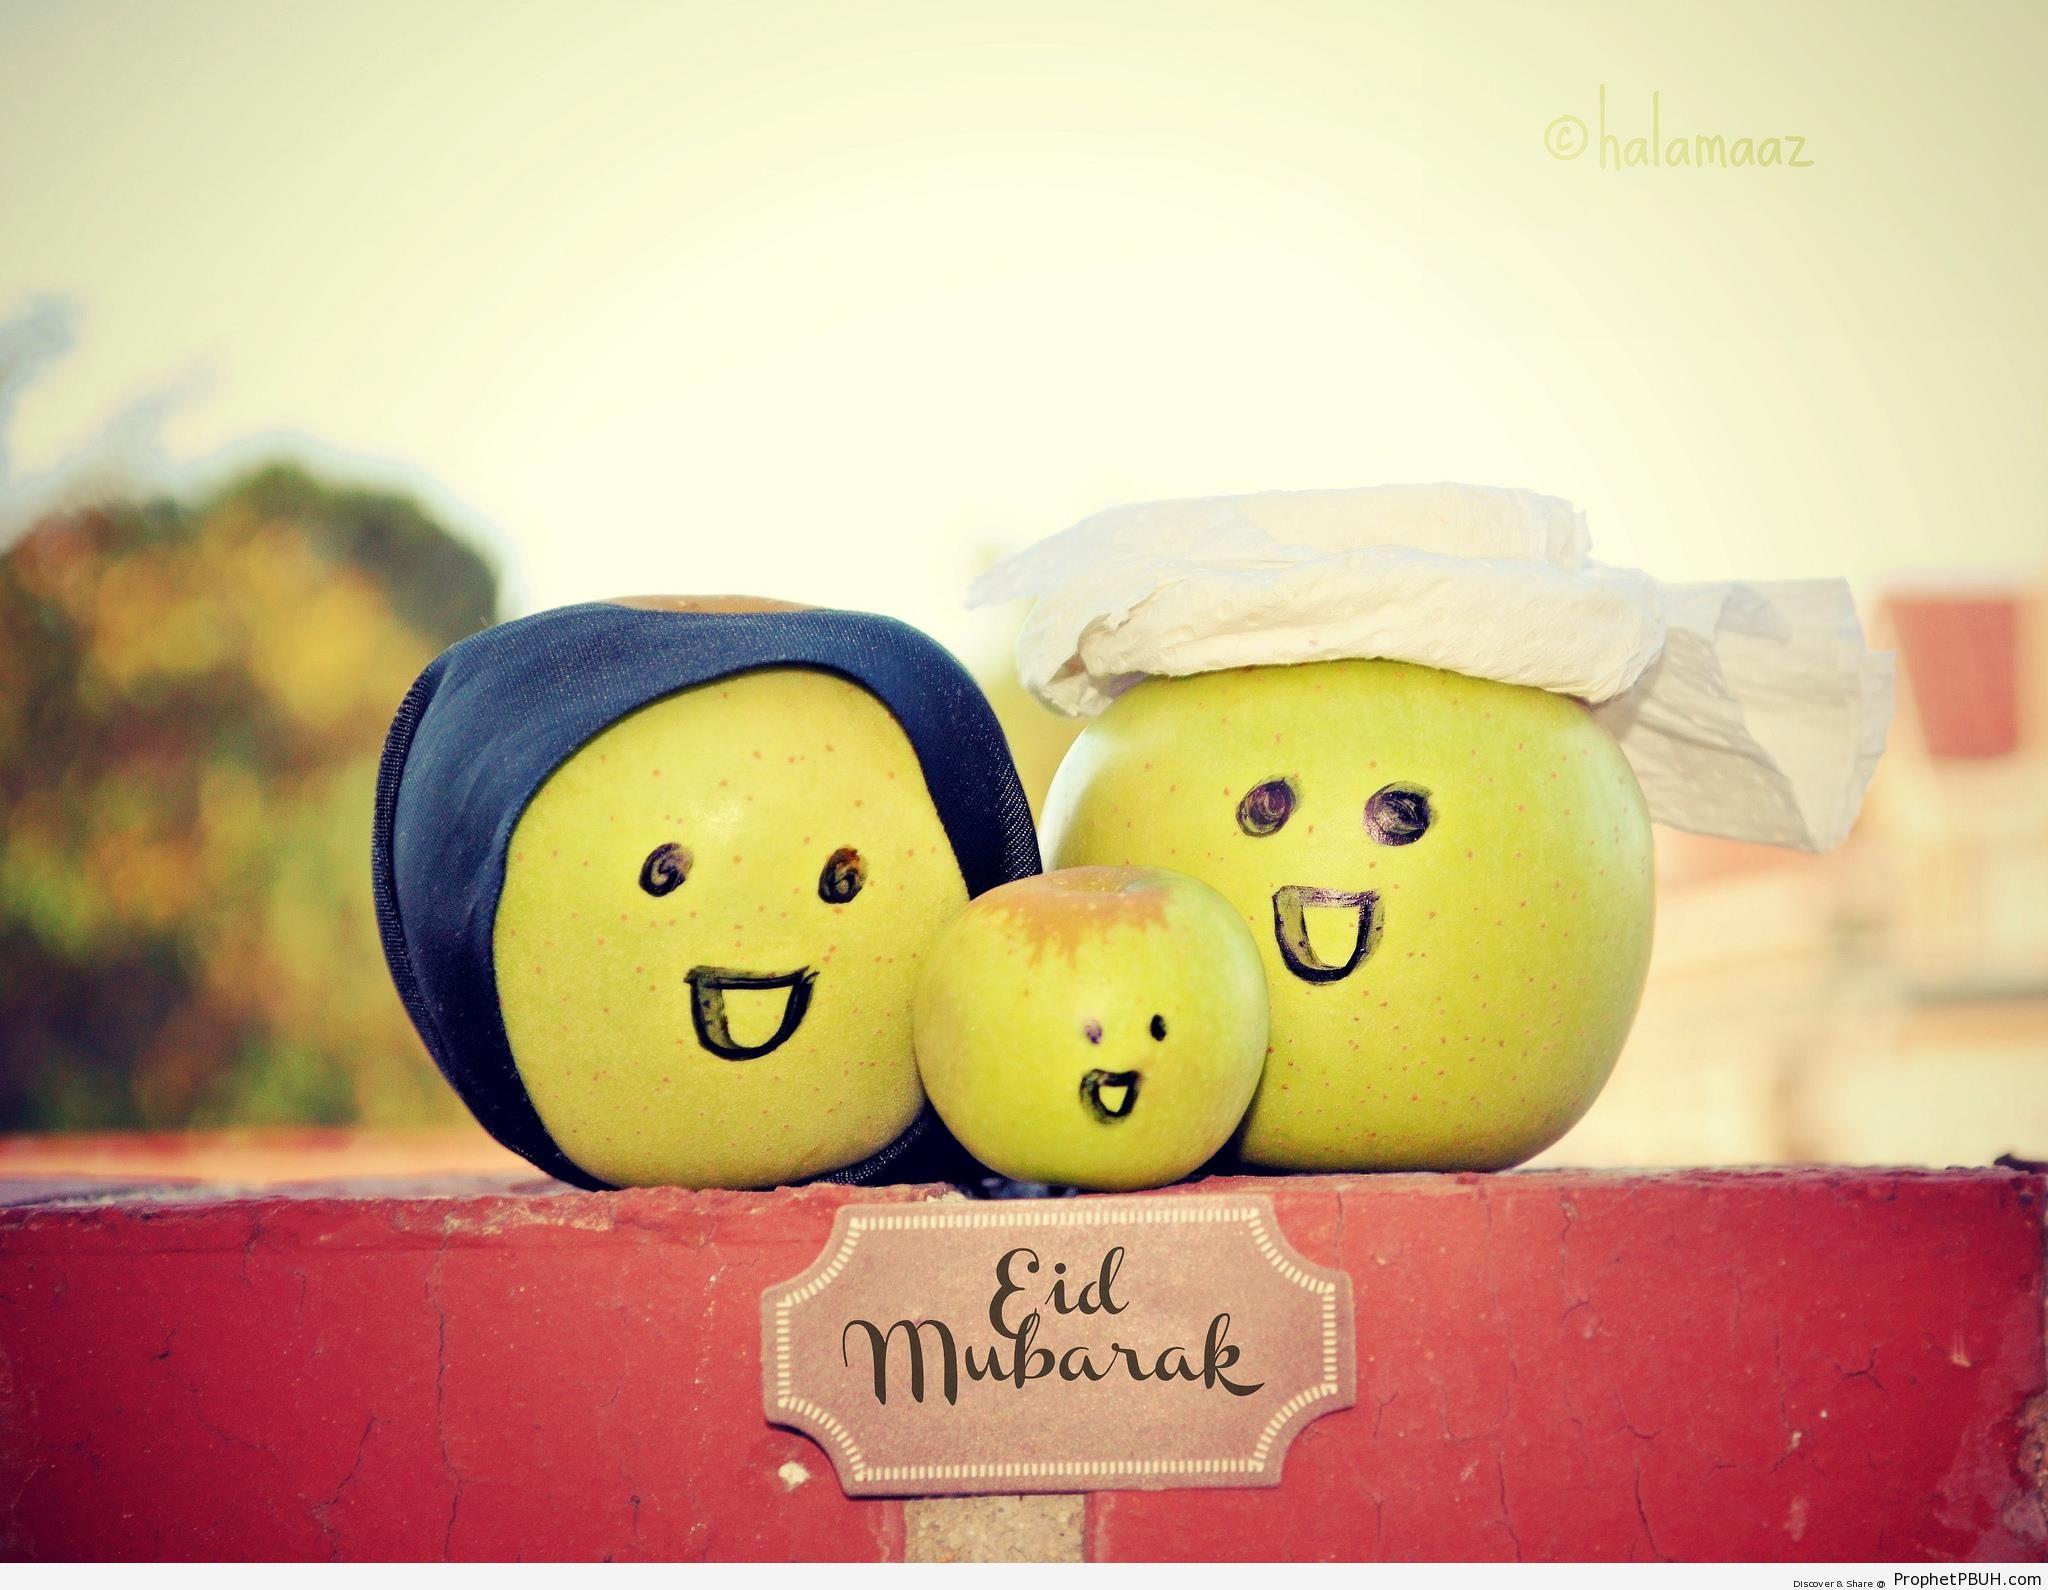 Eid Mubarak Greeting Written Under Smiling Muslim Apple Family - Eid Mubarak Greeting Cards, Graphics, and Wallpapers